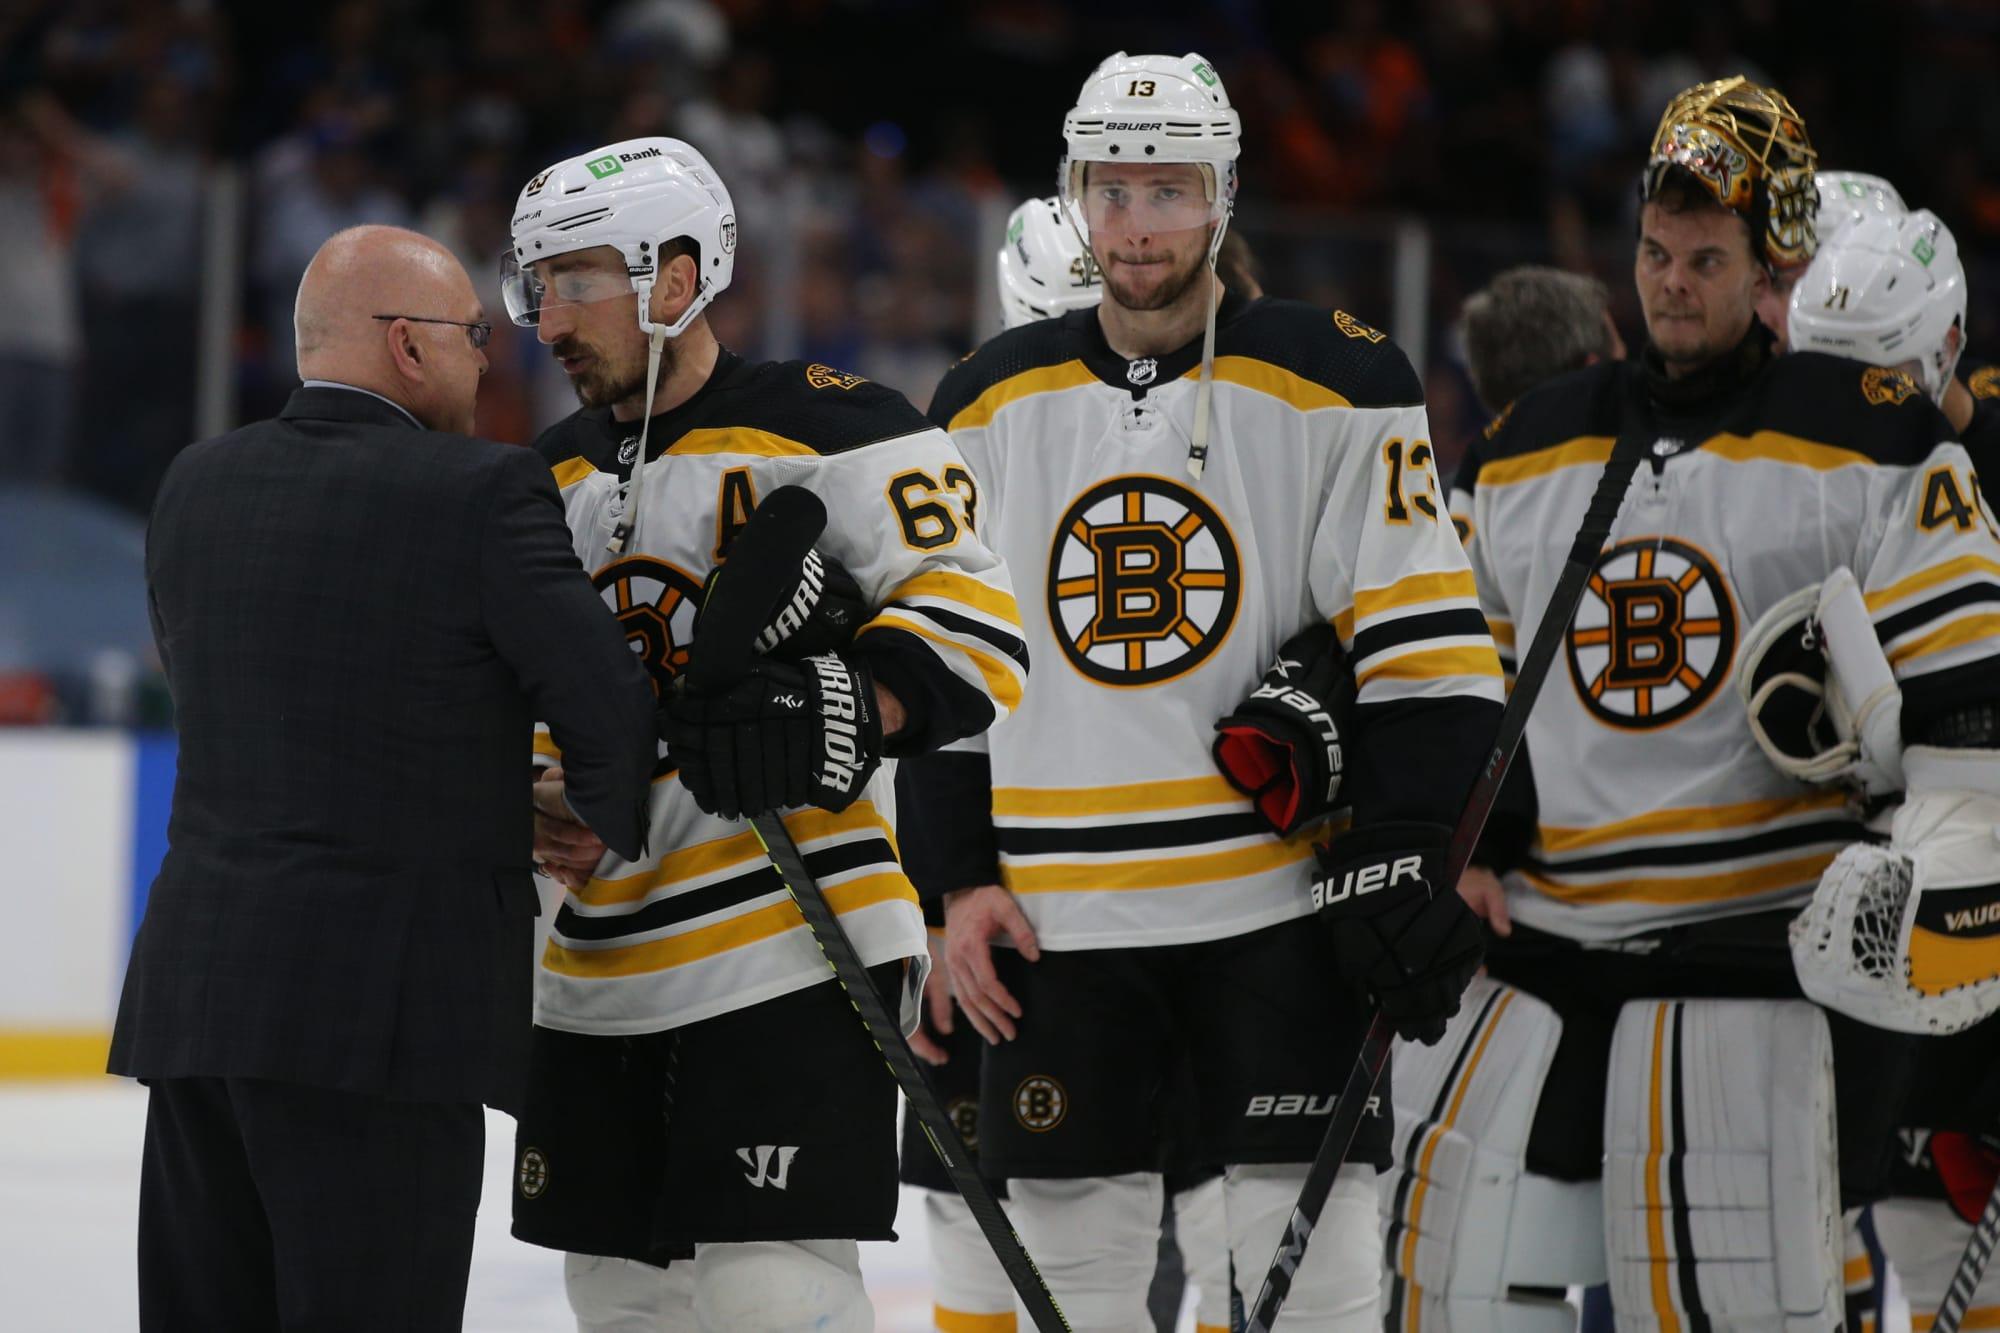 Boston Bruins: 7 players who won't return next season